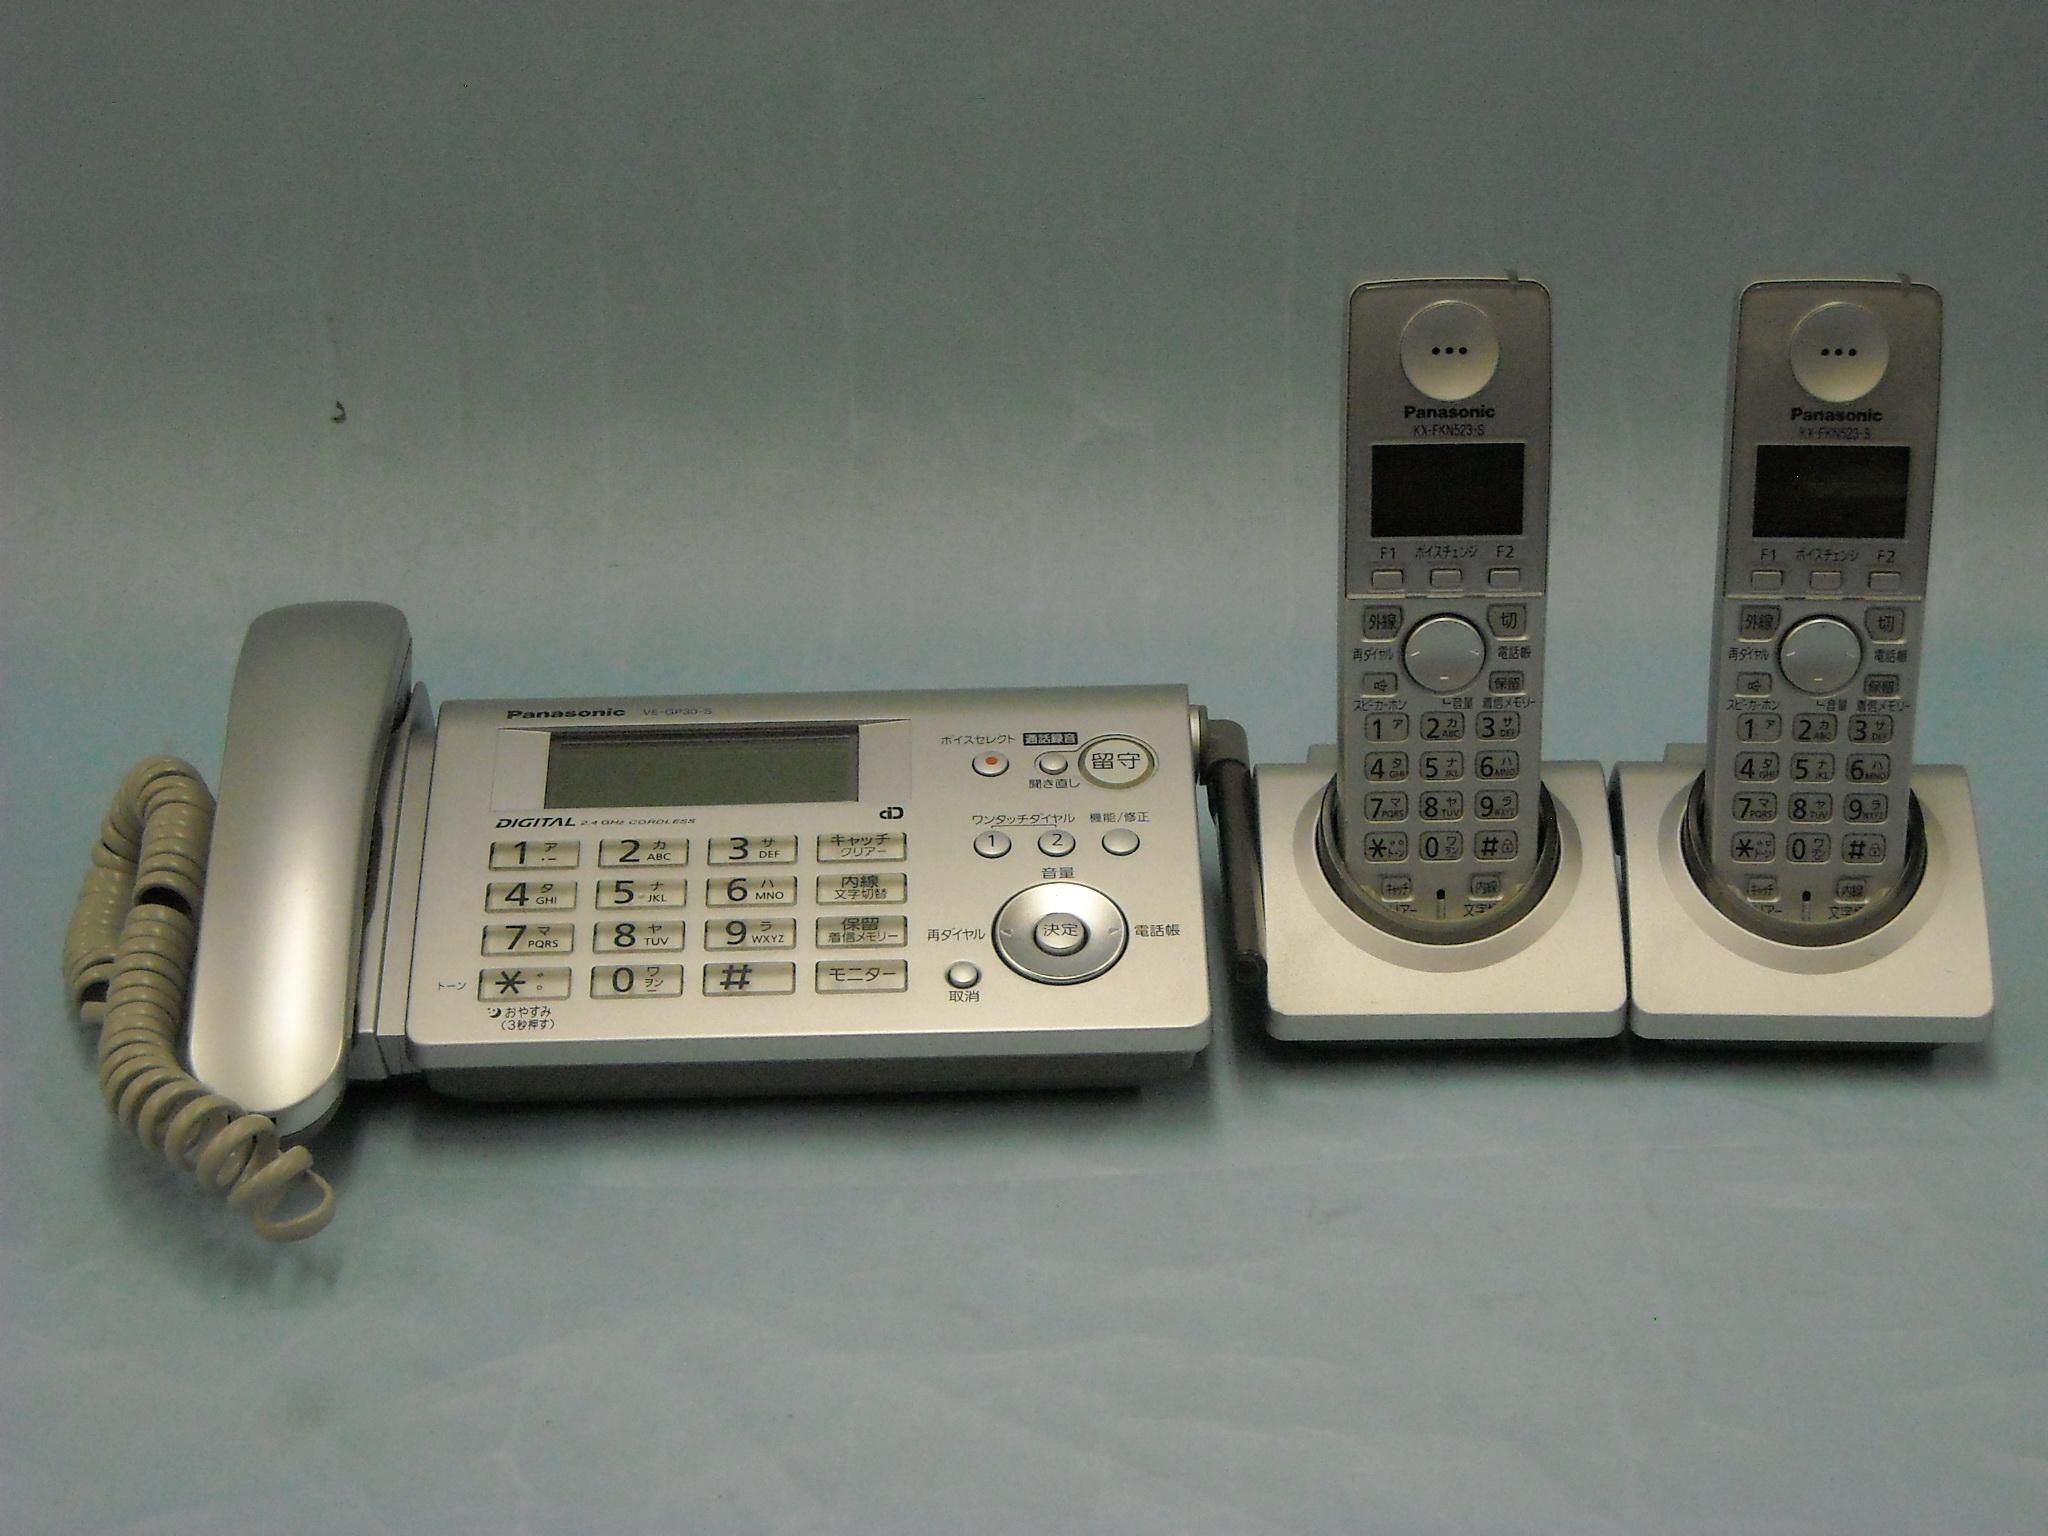 Panasonic電話機買取|名古屋リサイクルショップ ハードオフ西尾